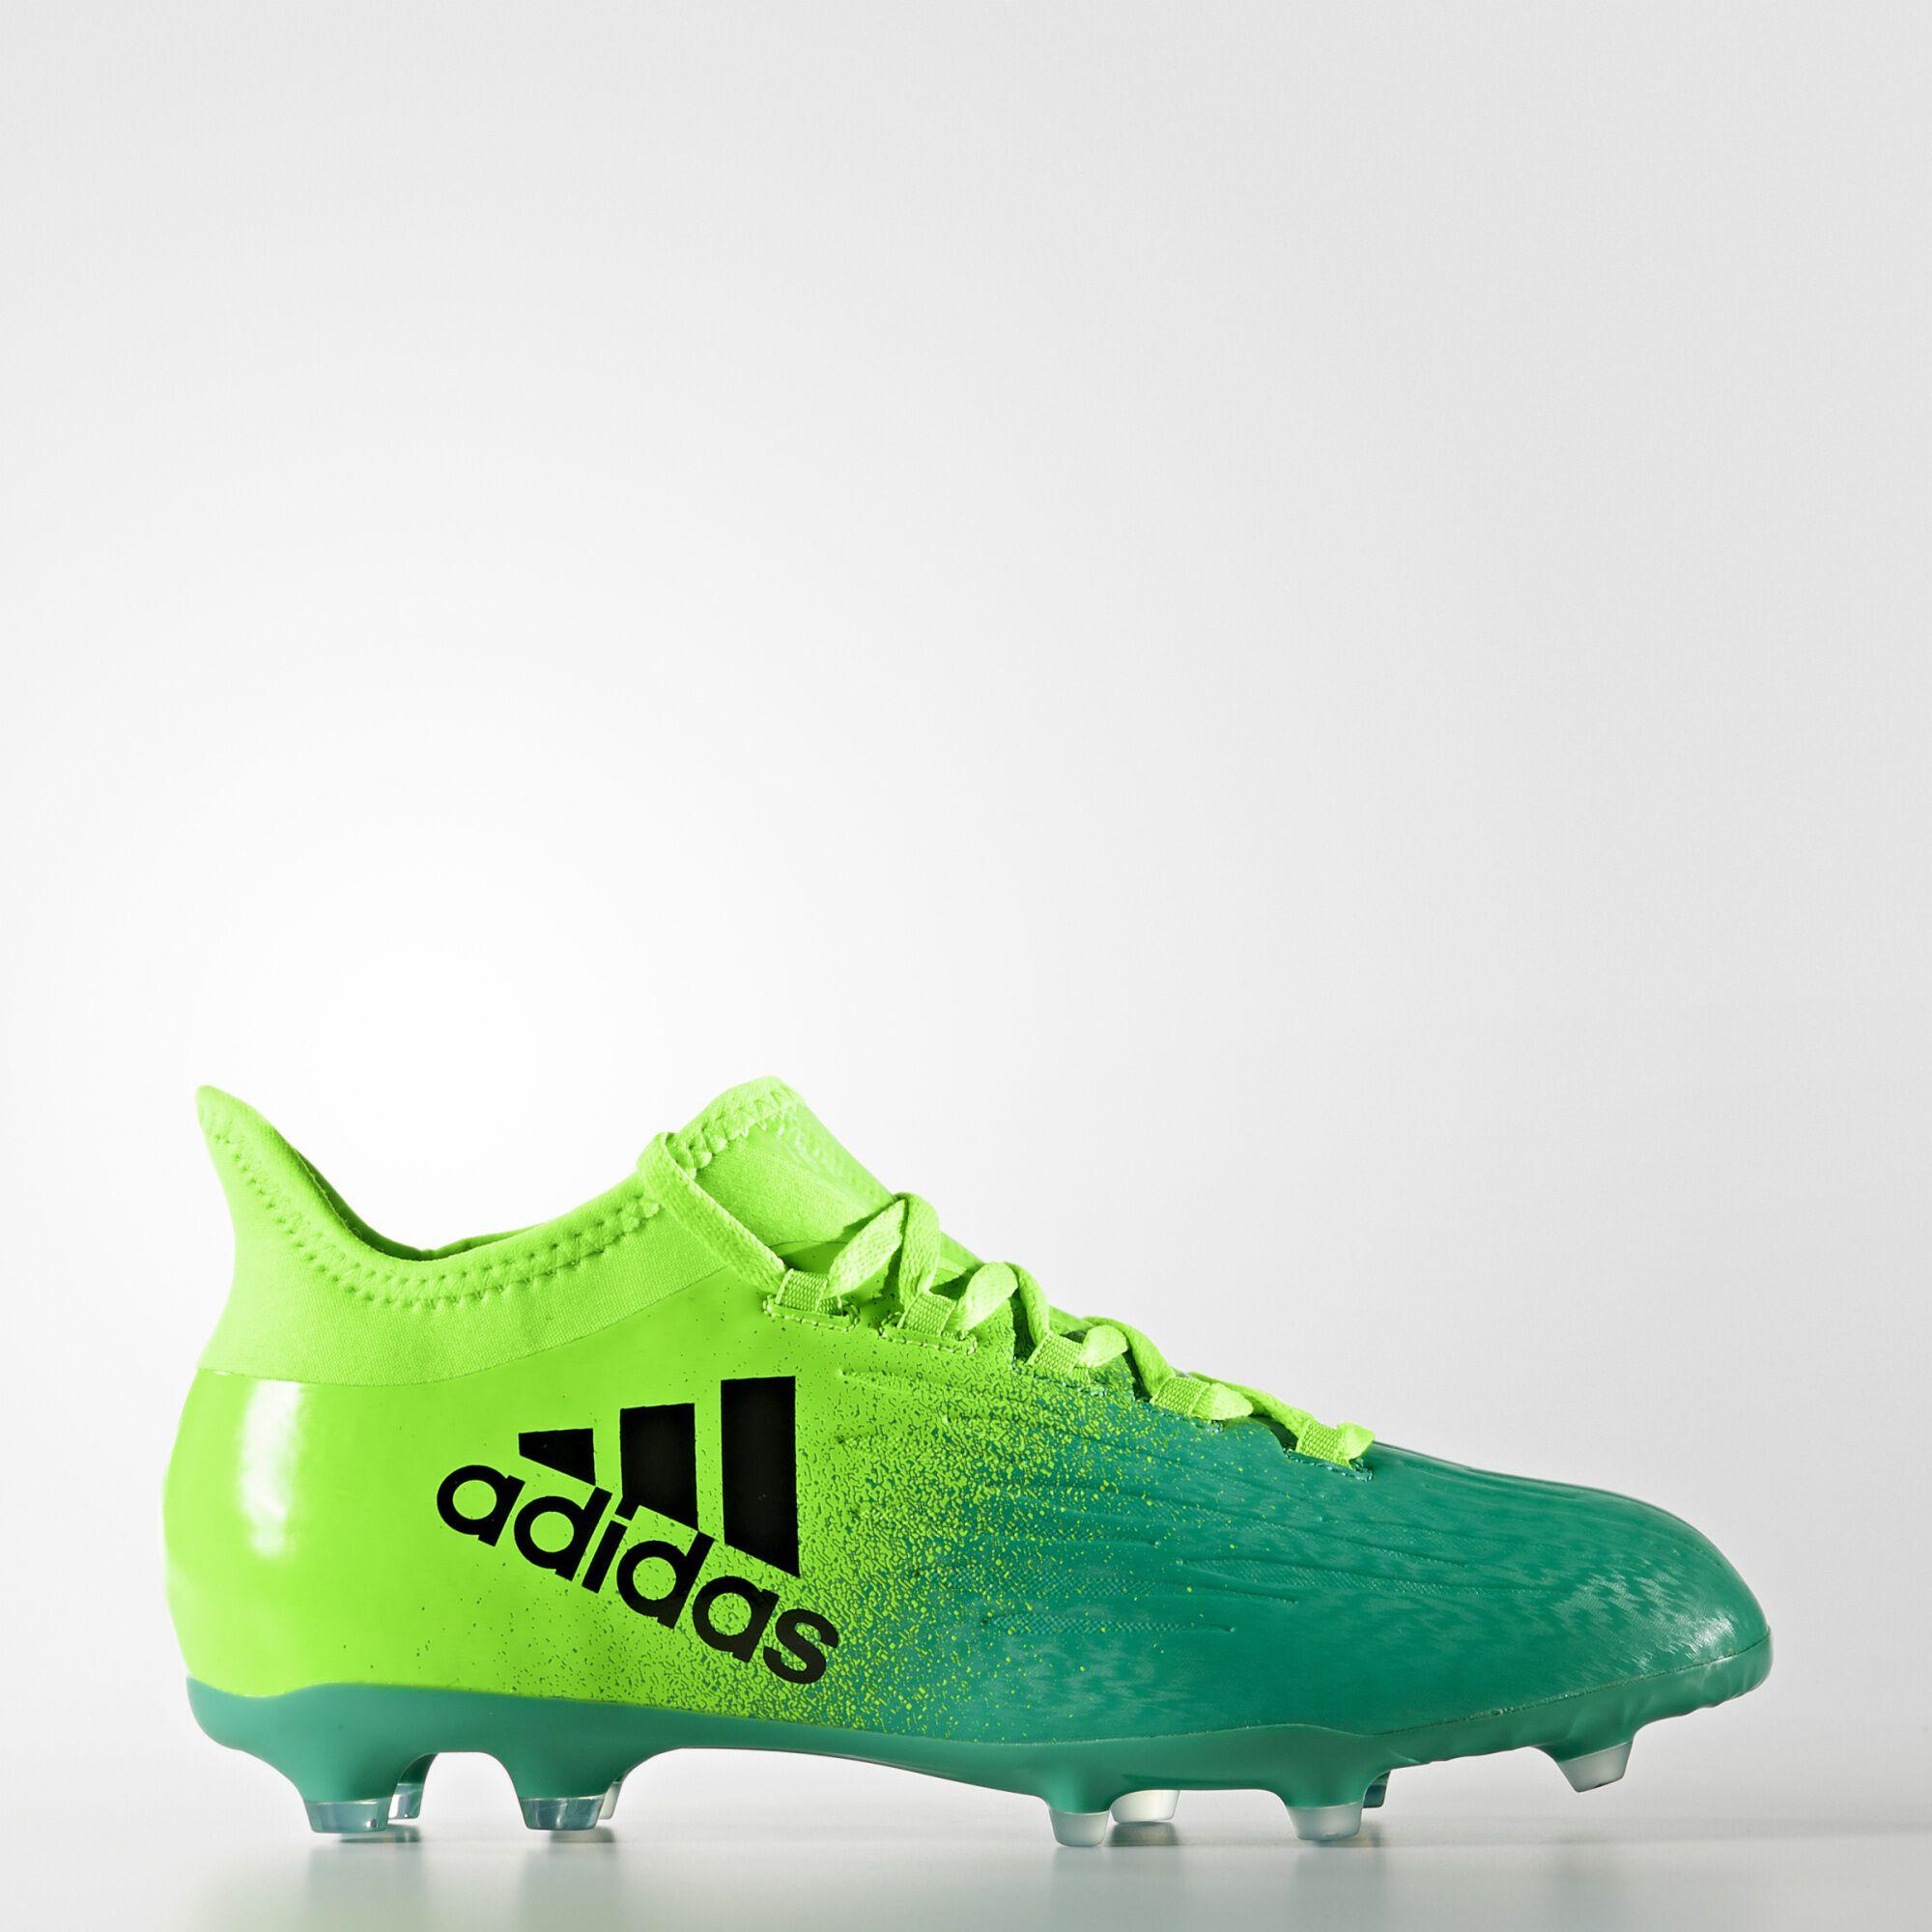 2c086bccda8 green adidas soccer cleats